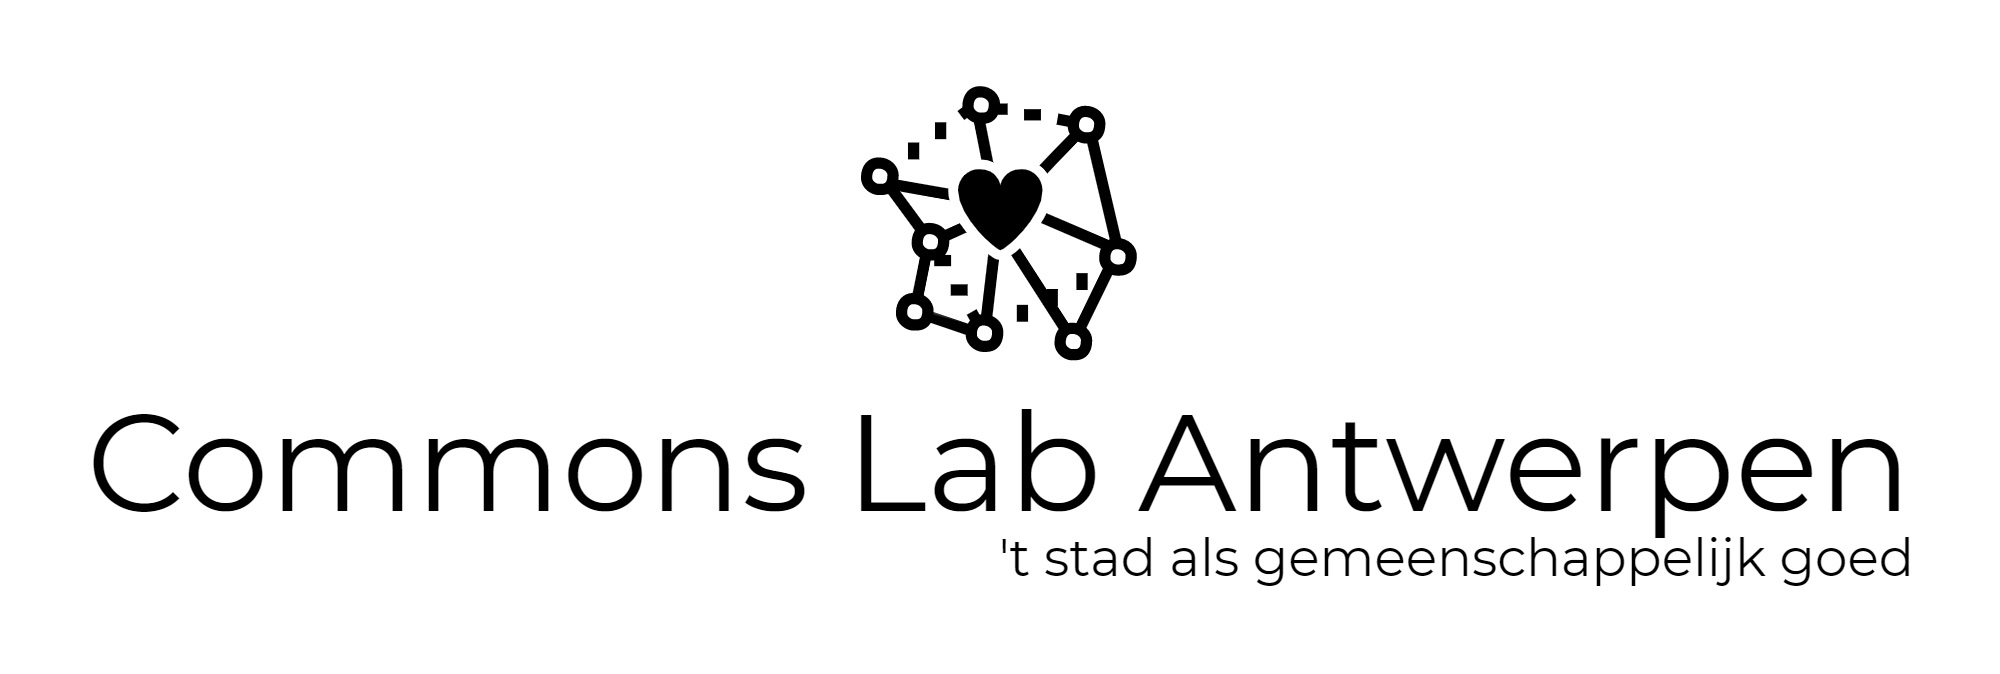 Commons Lab Antwerpen-logo.jpg